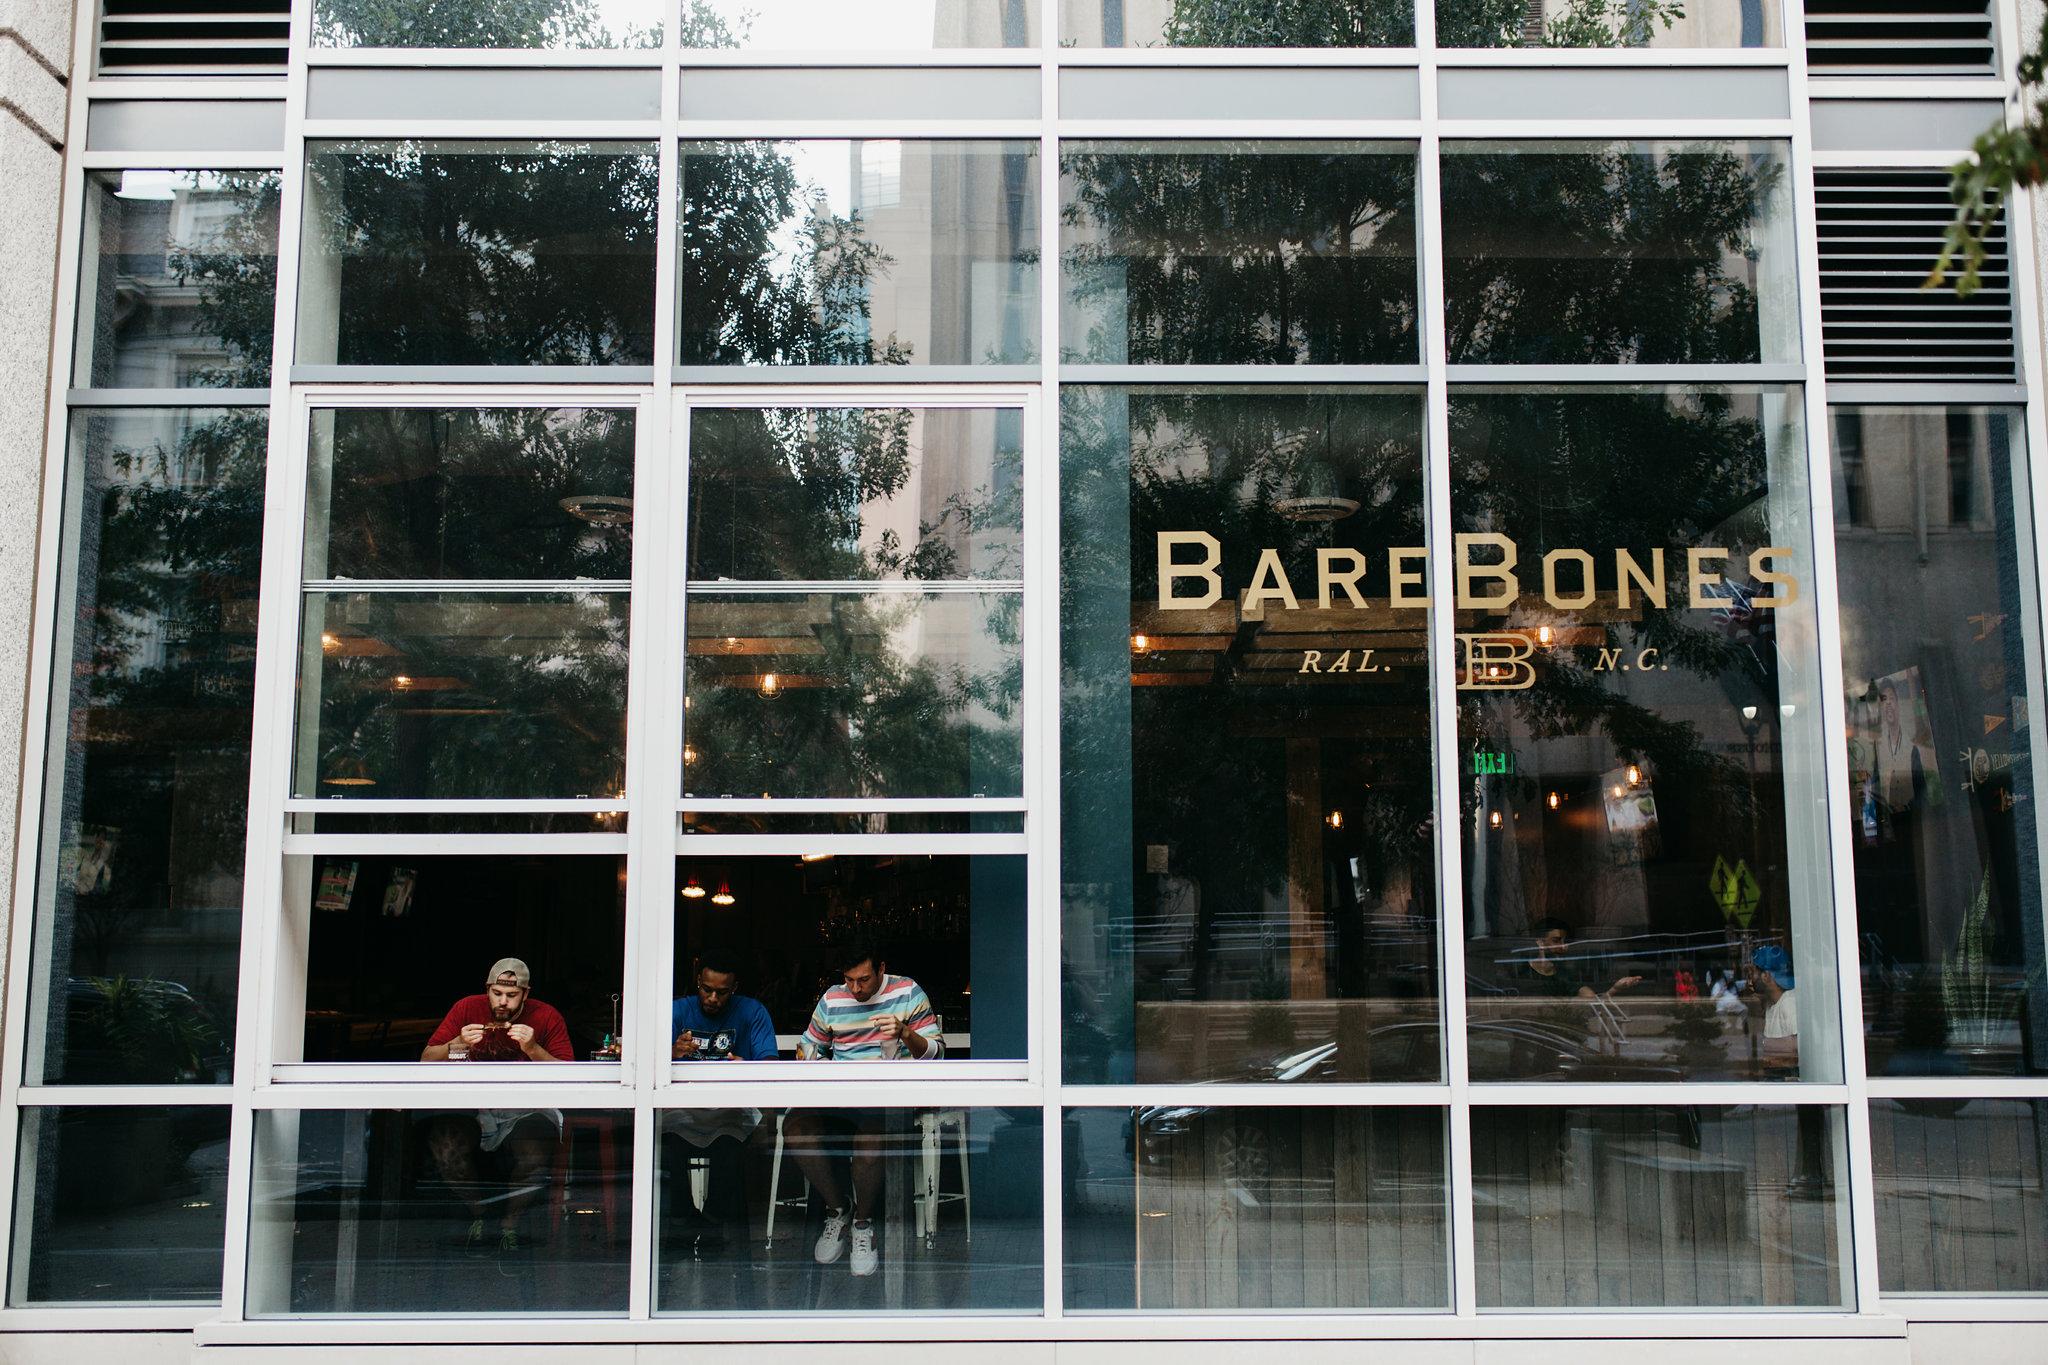 Design by Good South / Bare Bones Identity - Window Application